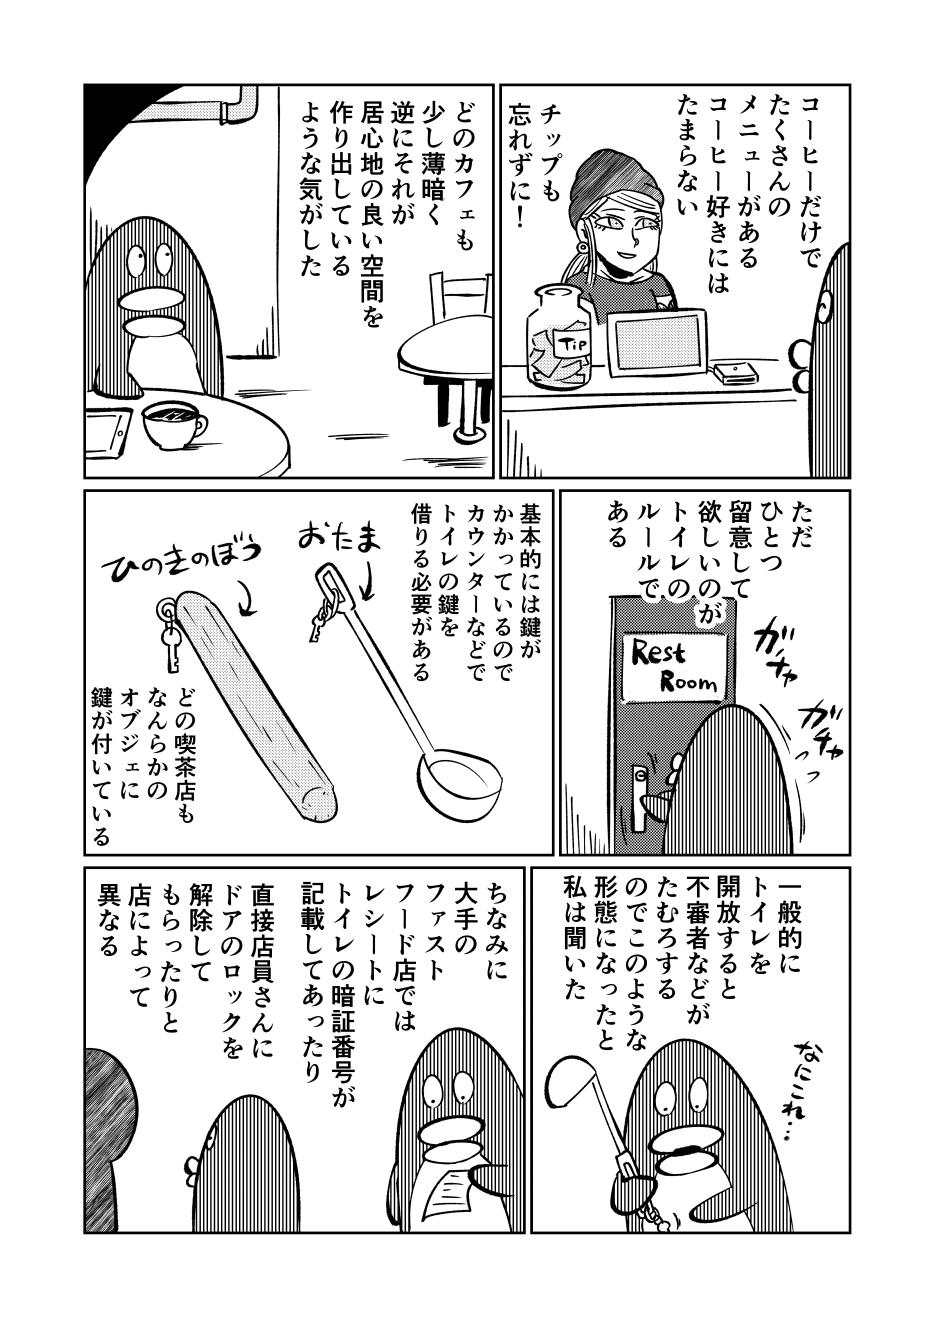 https://www.ryugaku.co.jp/blog/els_portland/upload/1b93caf17296ad27126f09e752c336699a43234c.jpg